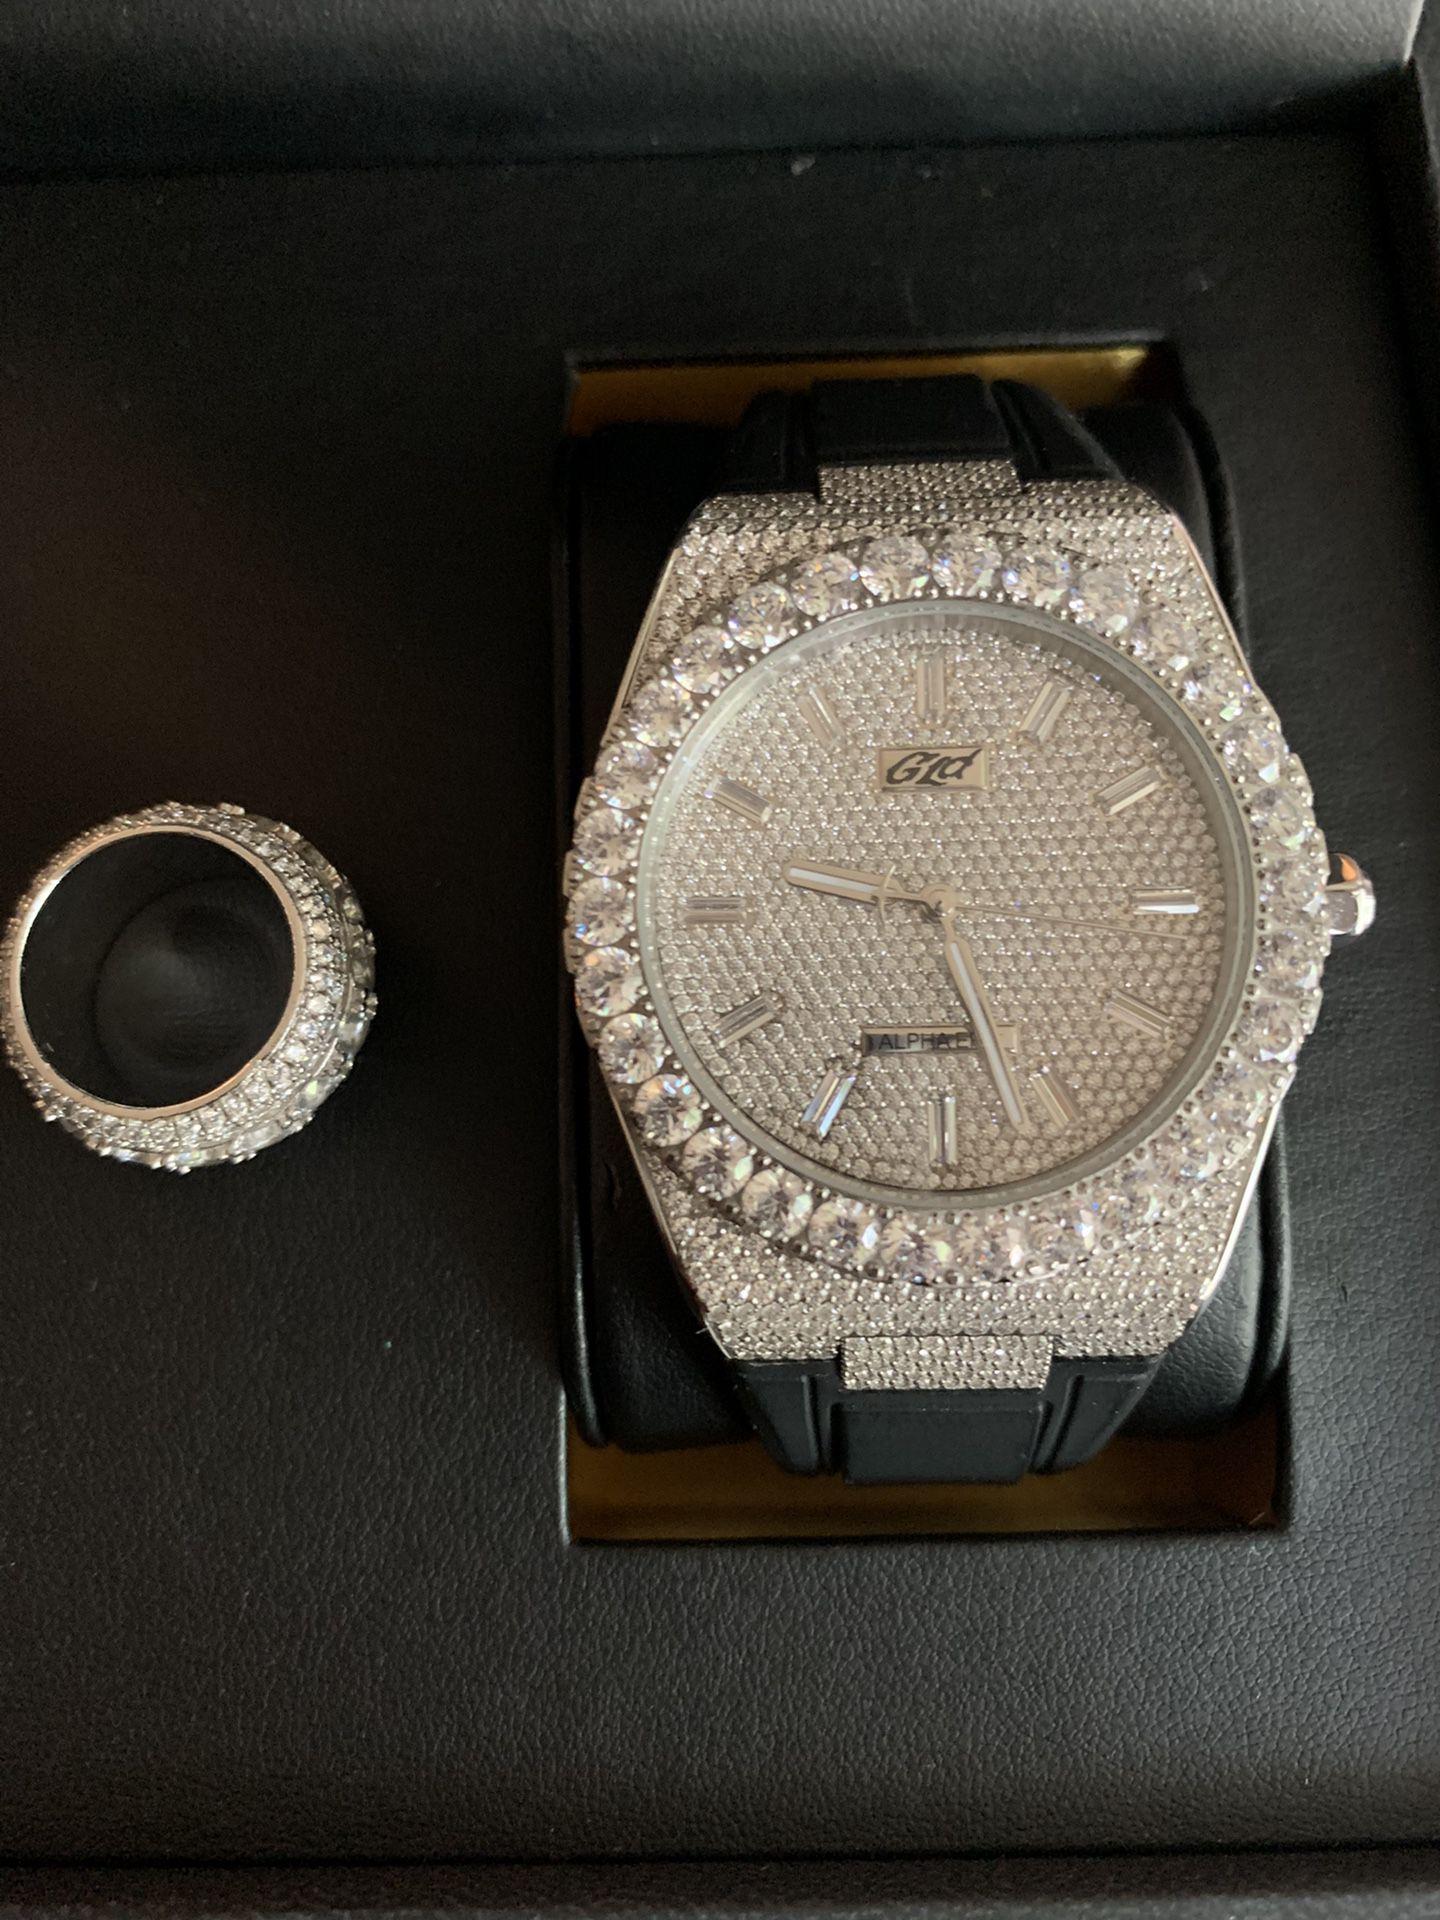 Gld Watch